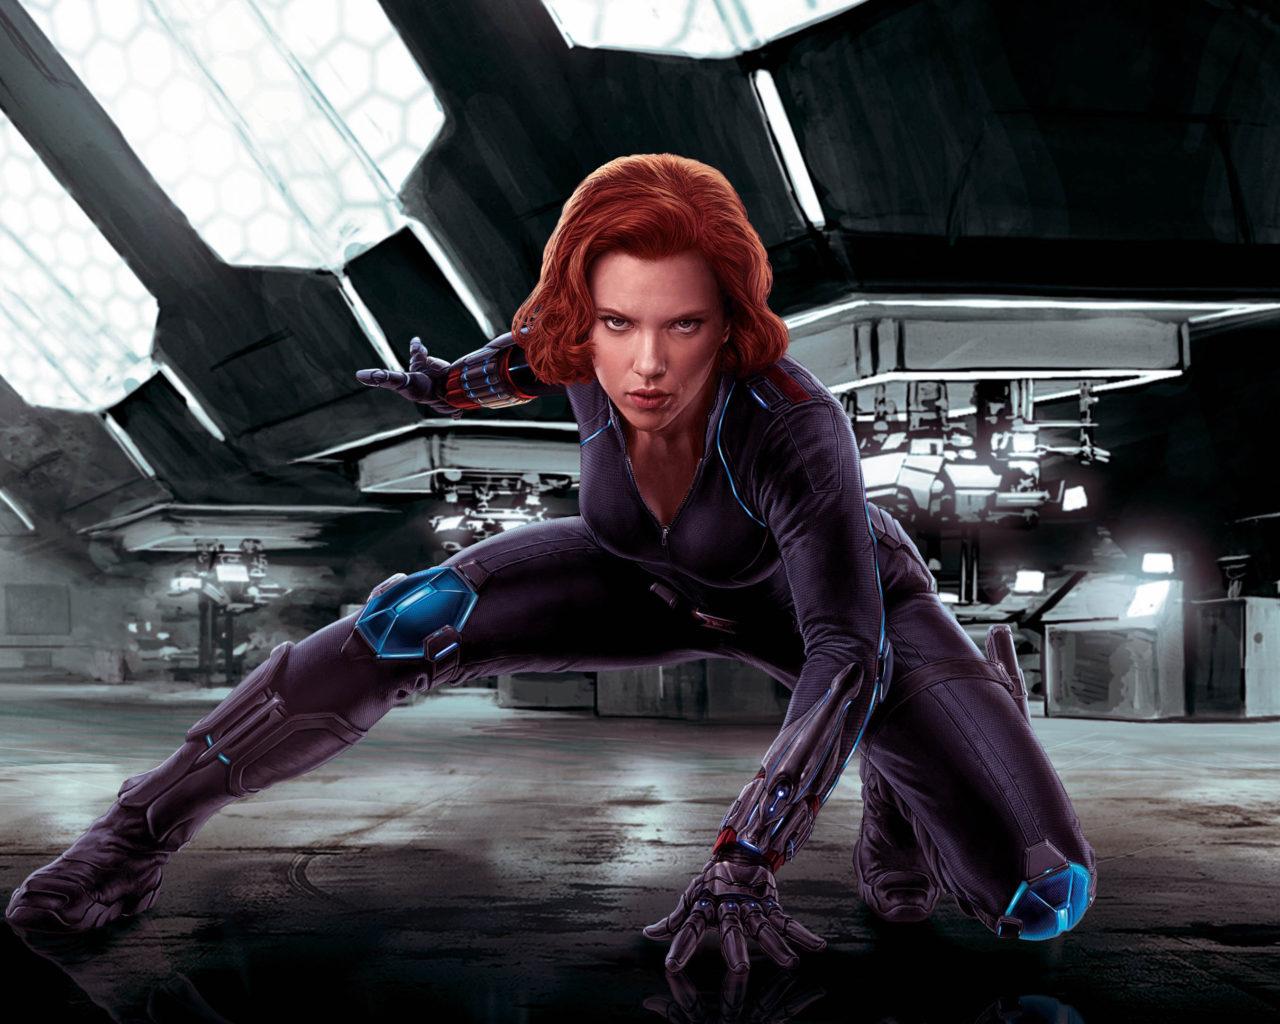 Scarlett Johansson Black Widow Ass - IgFAP